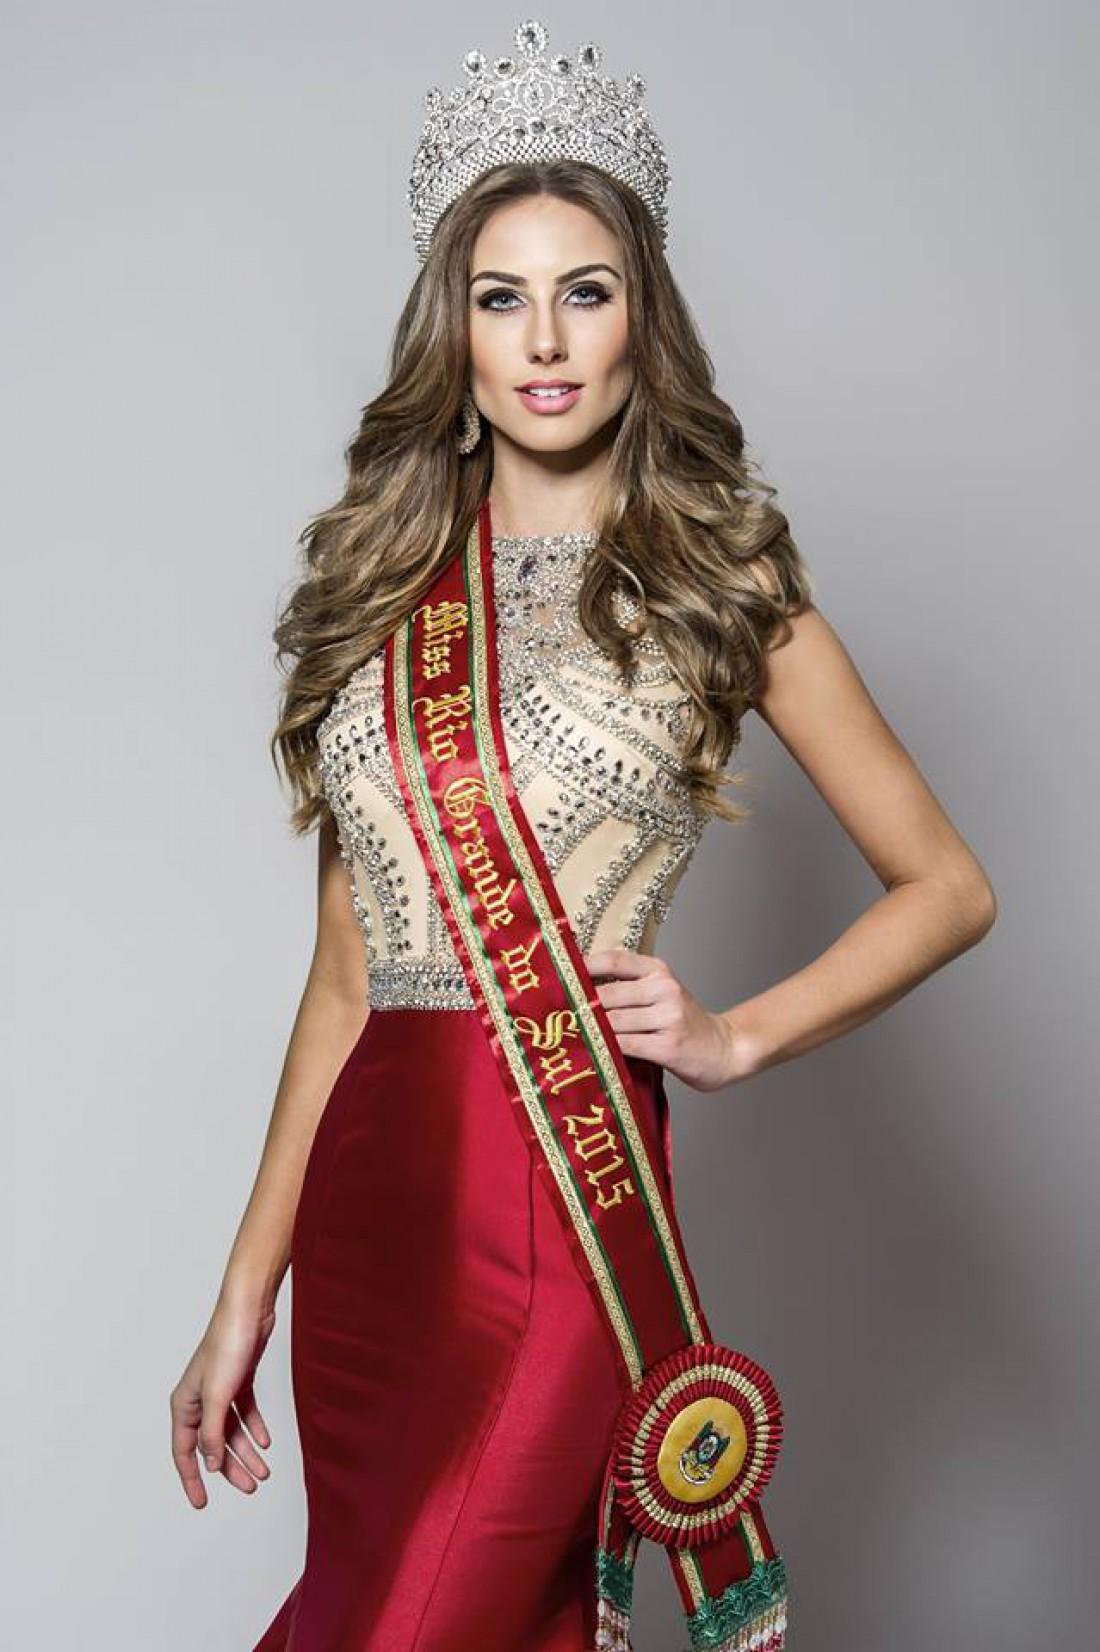 Мисс Бразилия 2015 Мартина Брандт попала в топ